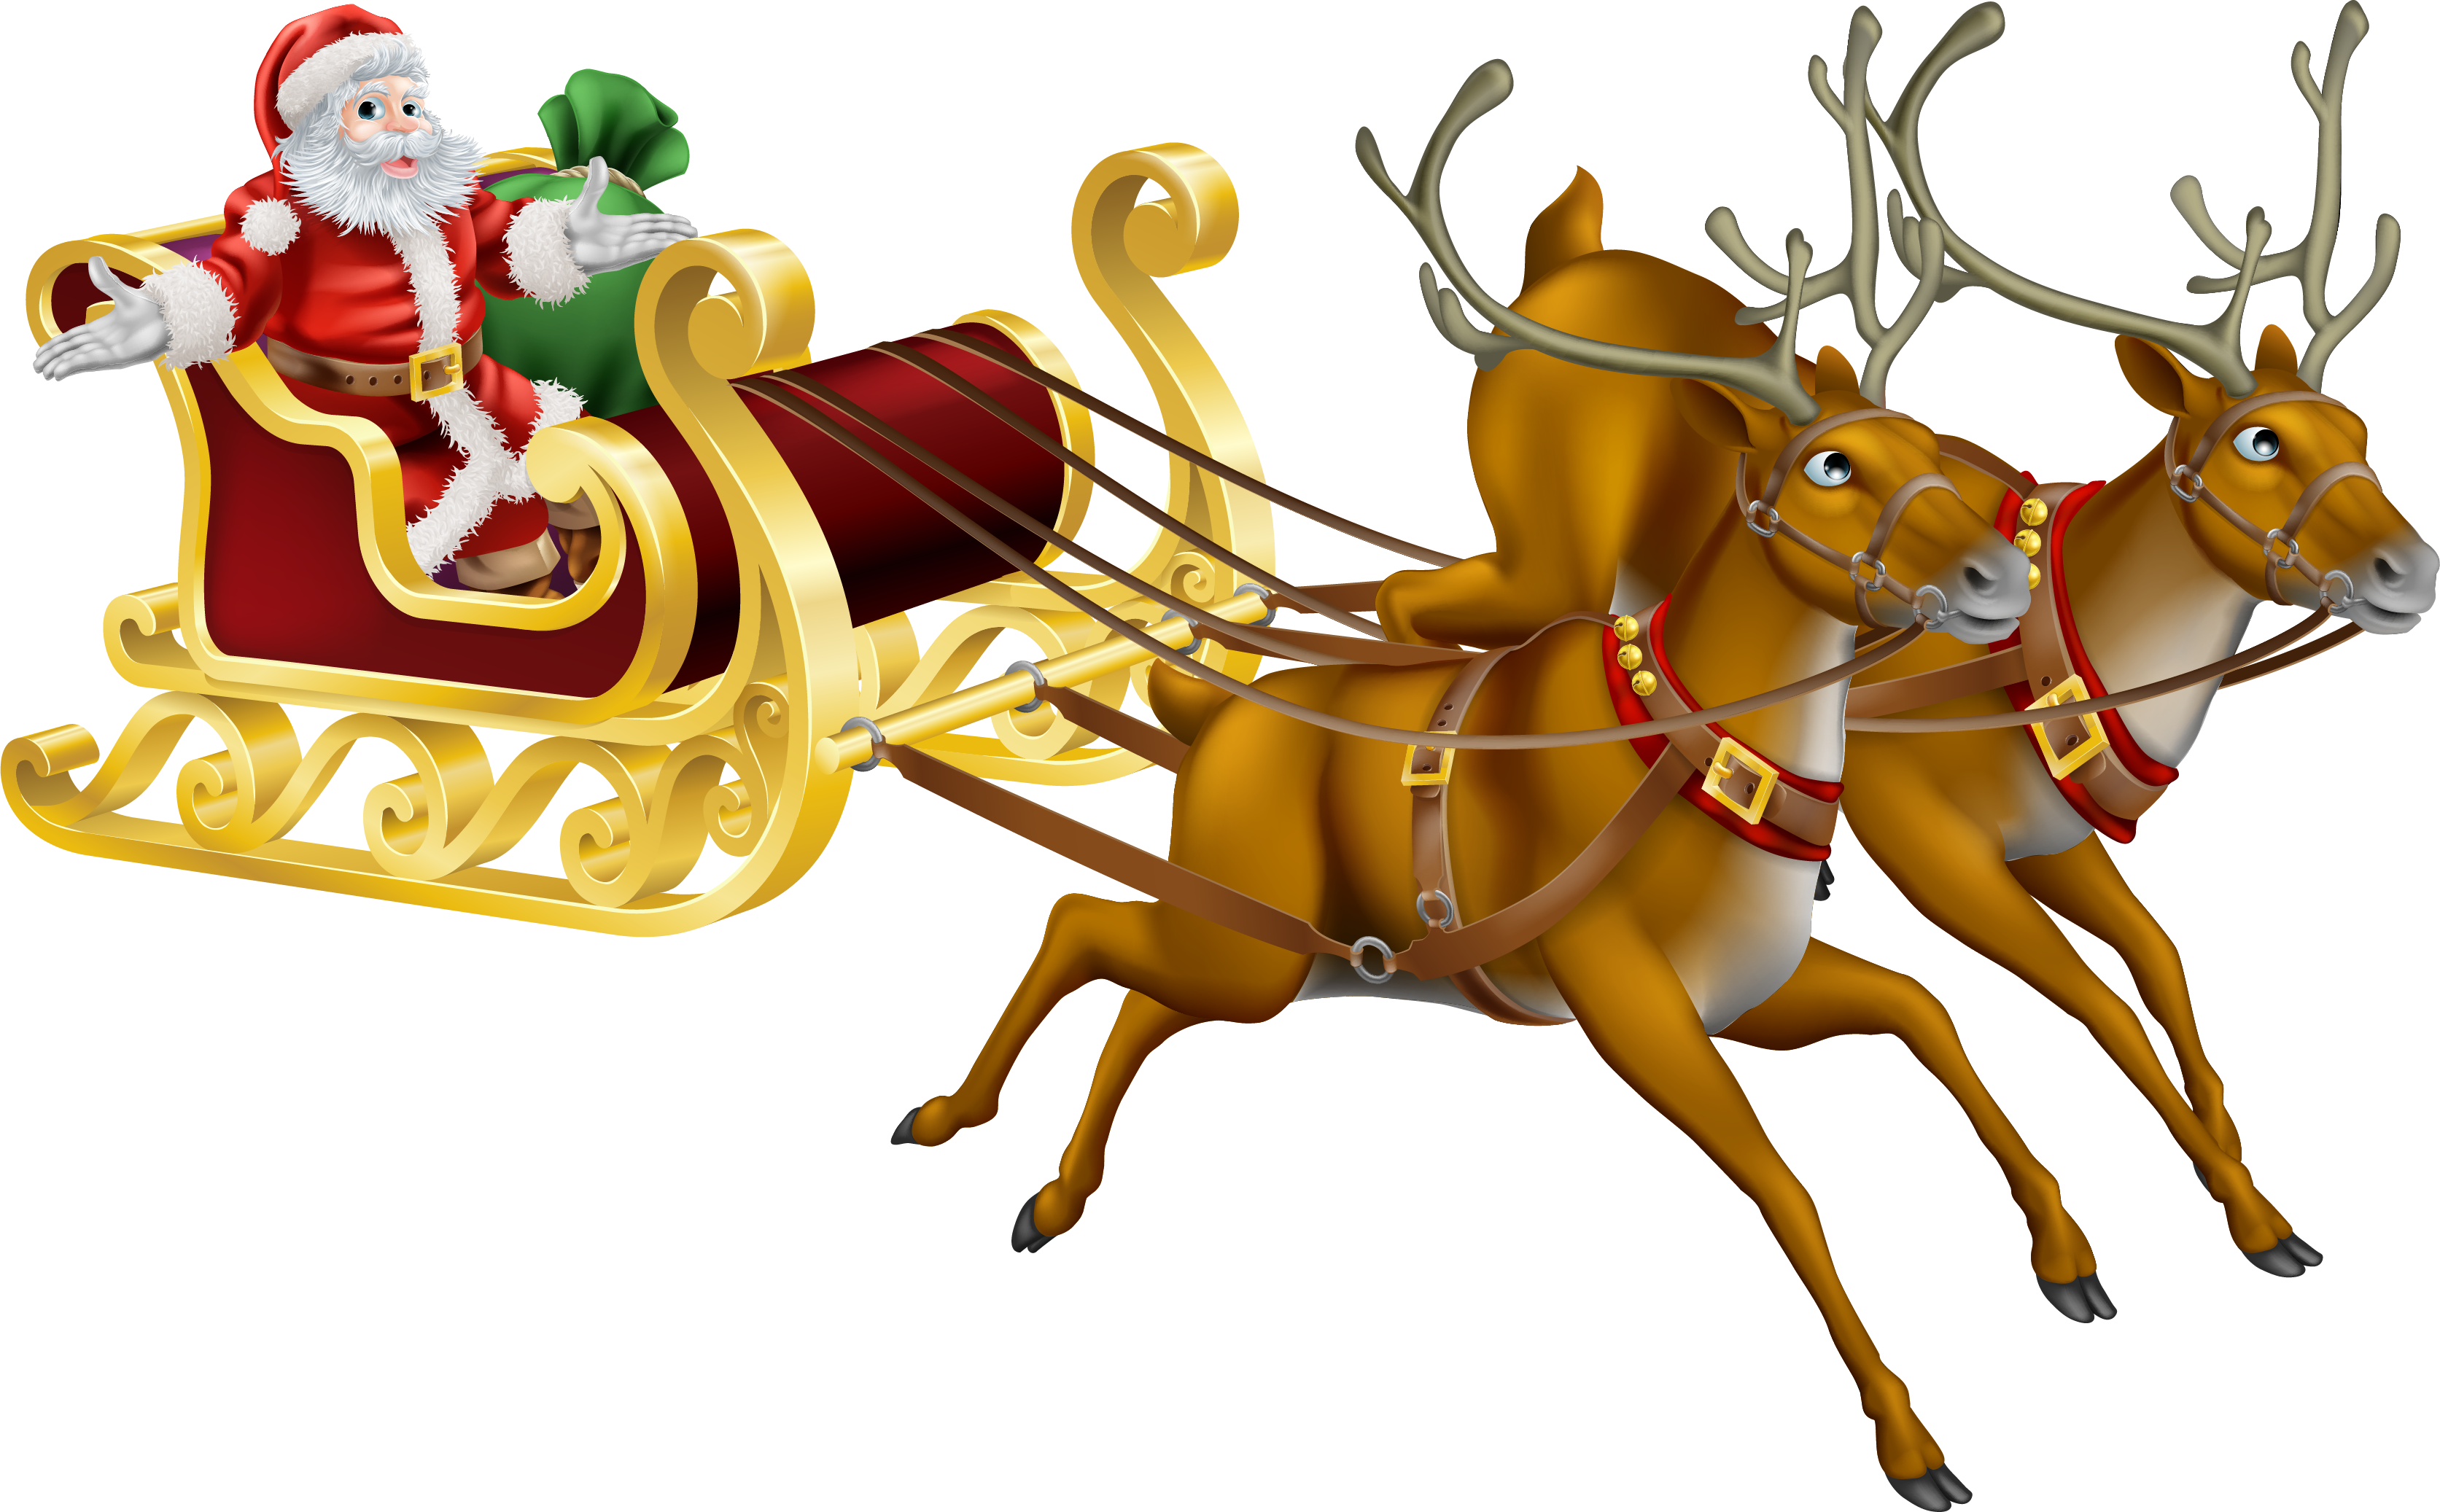 Rudolph Santa Claus Reindeer Christmas.